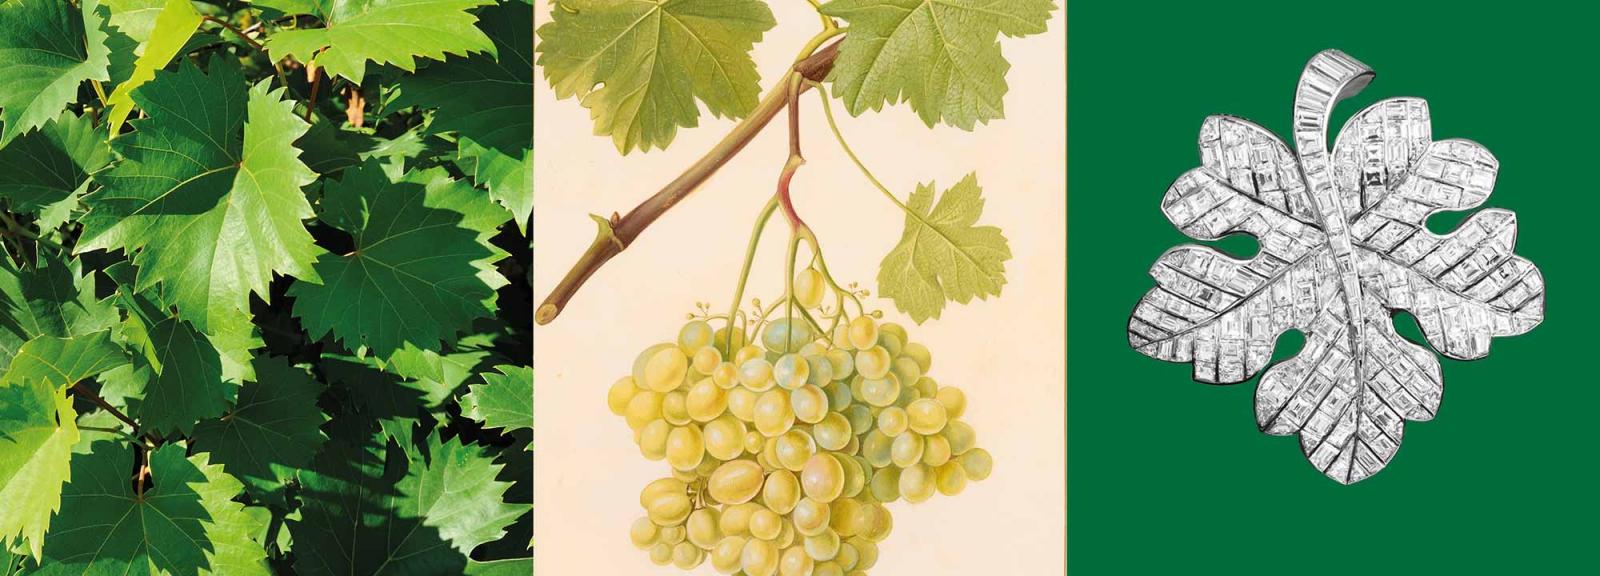 Calendrier floral - Septembre : vigne © MNHN / Collection Van Cleef & Arpels